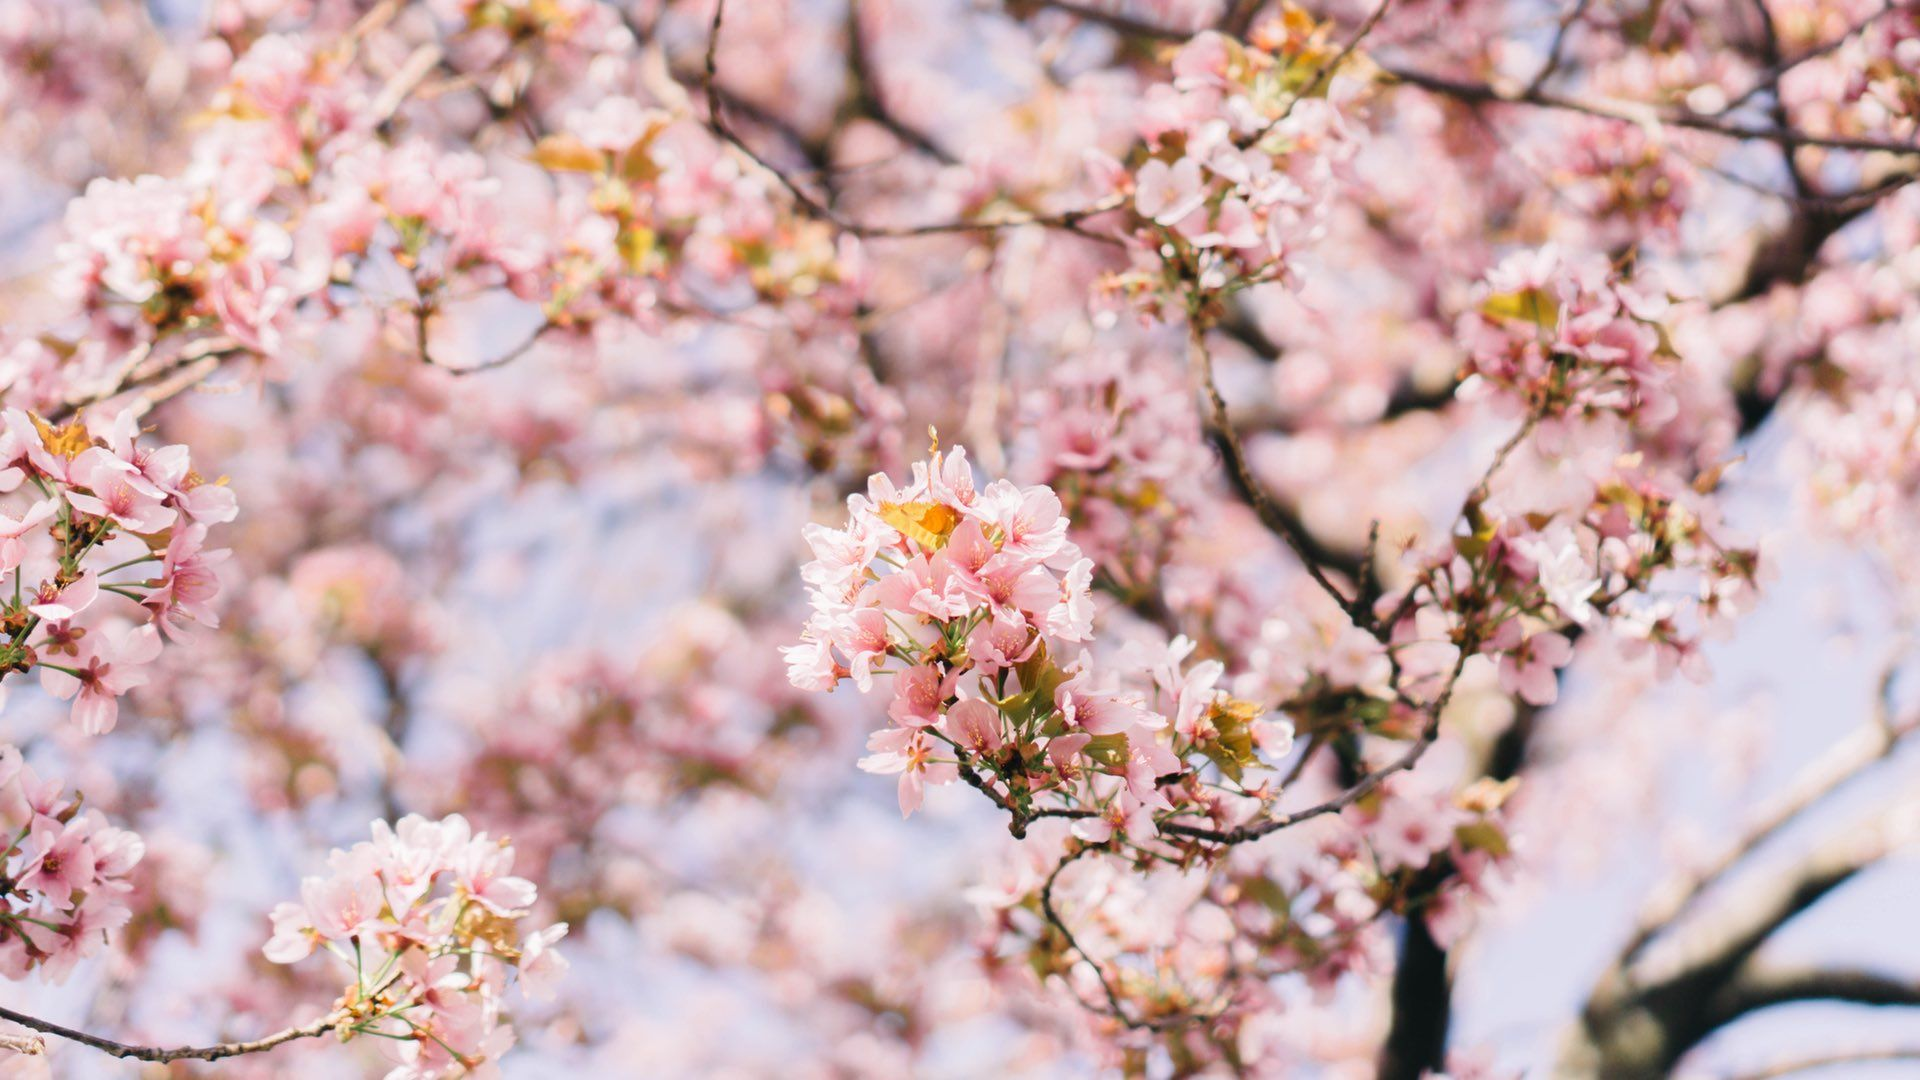 Read Concrete Playground's take on Sydney Cherry Blossom ...